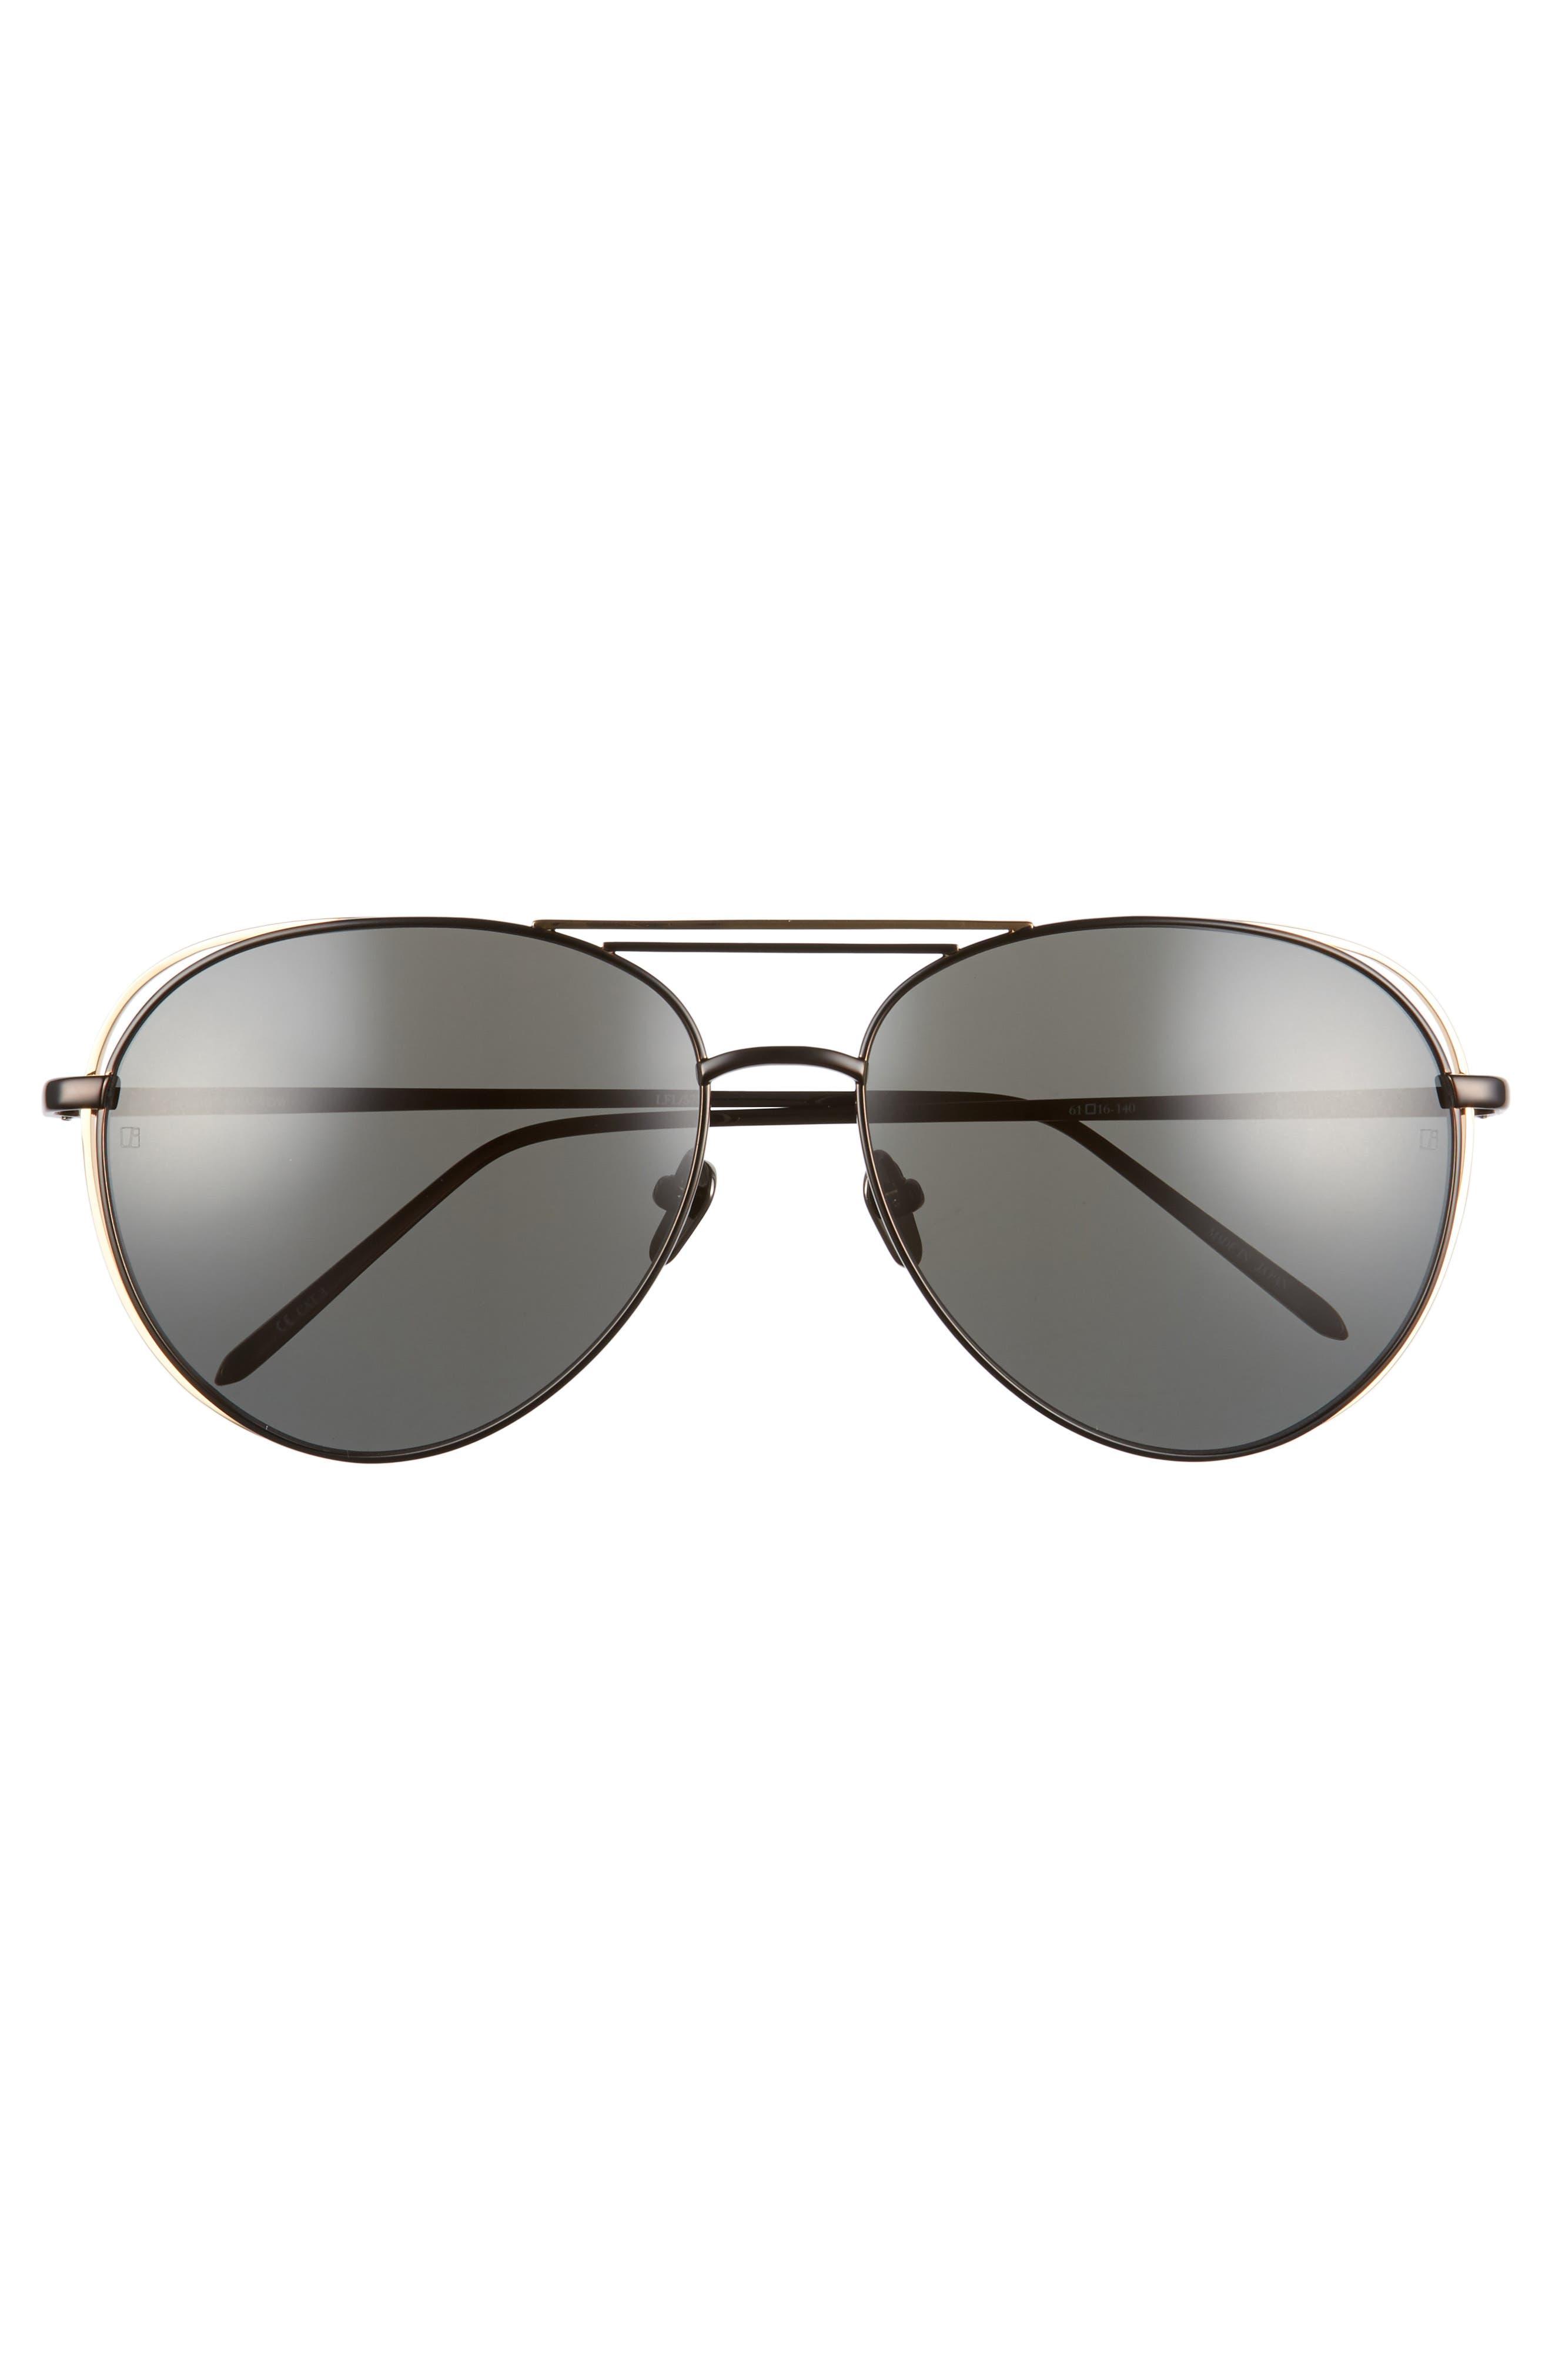 61mm 18 Karat Gold Aviator Sunglasses,                             Alternate thumbnail 7, color,